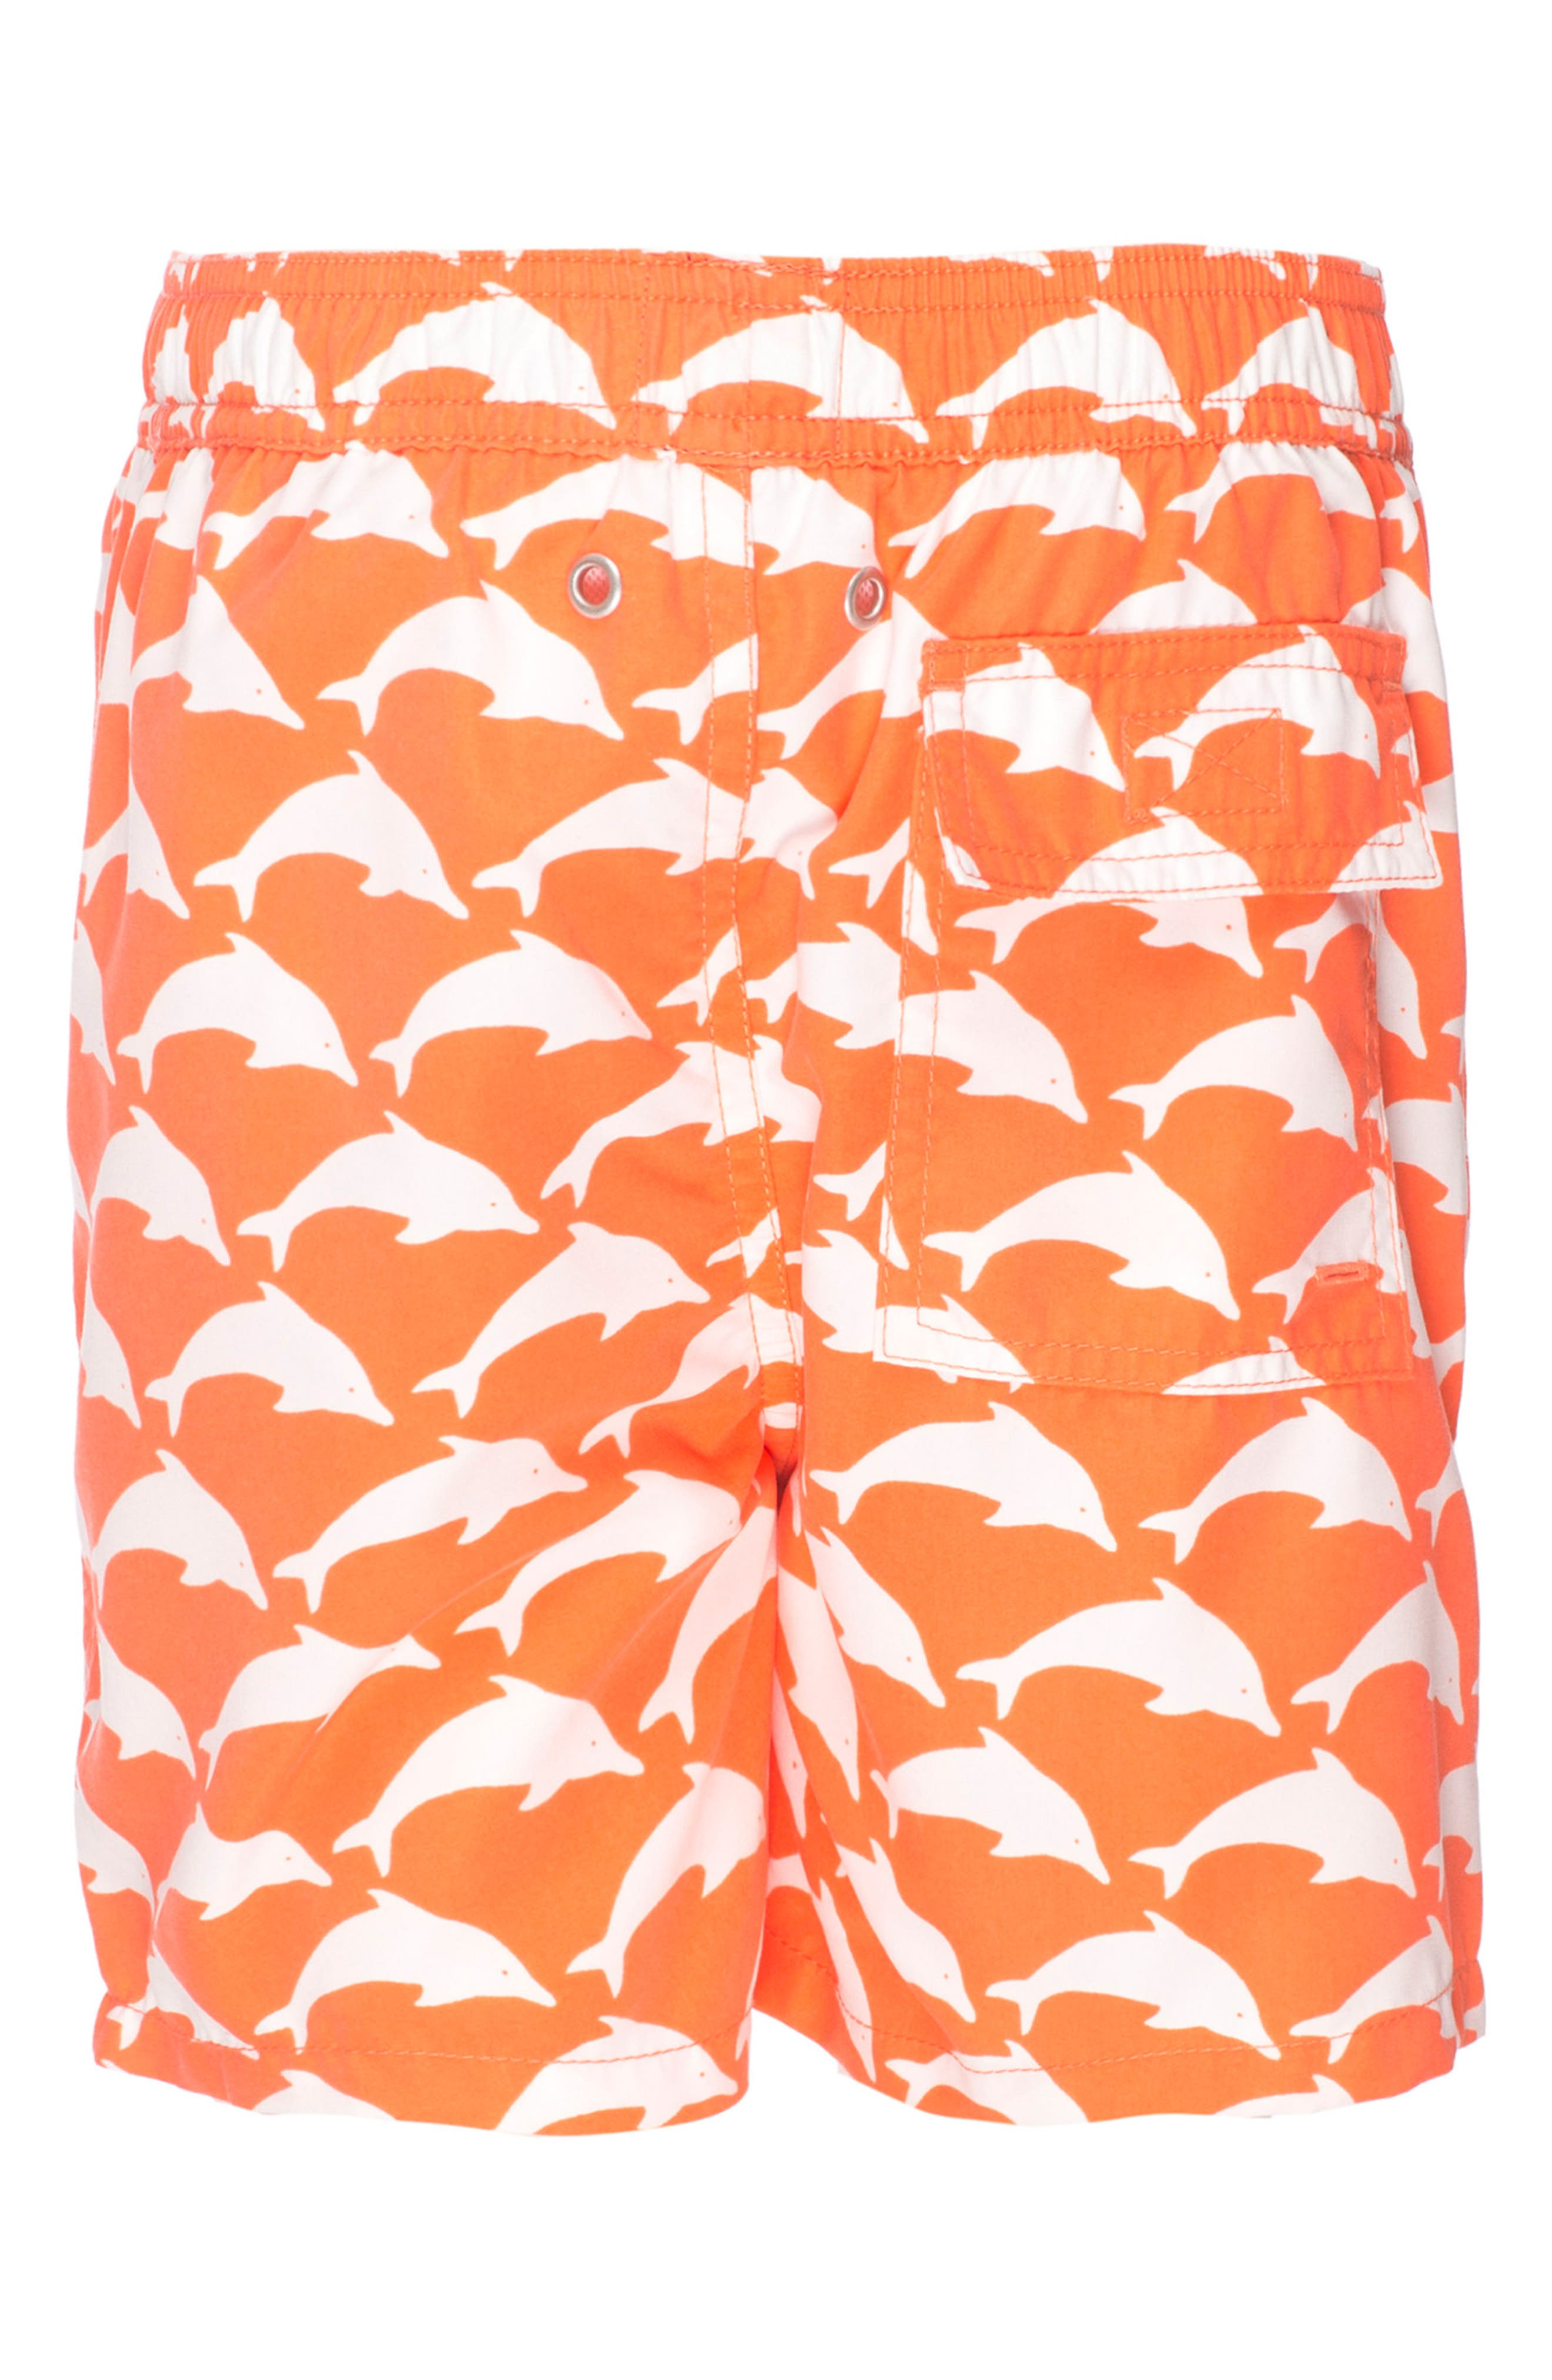 Dolphin Swim Trunks,                             Alternate thumbnail 4, color,